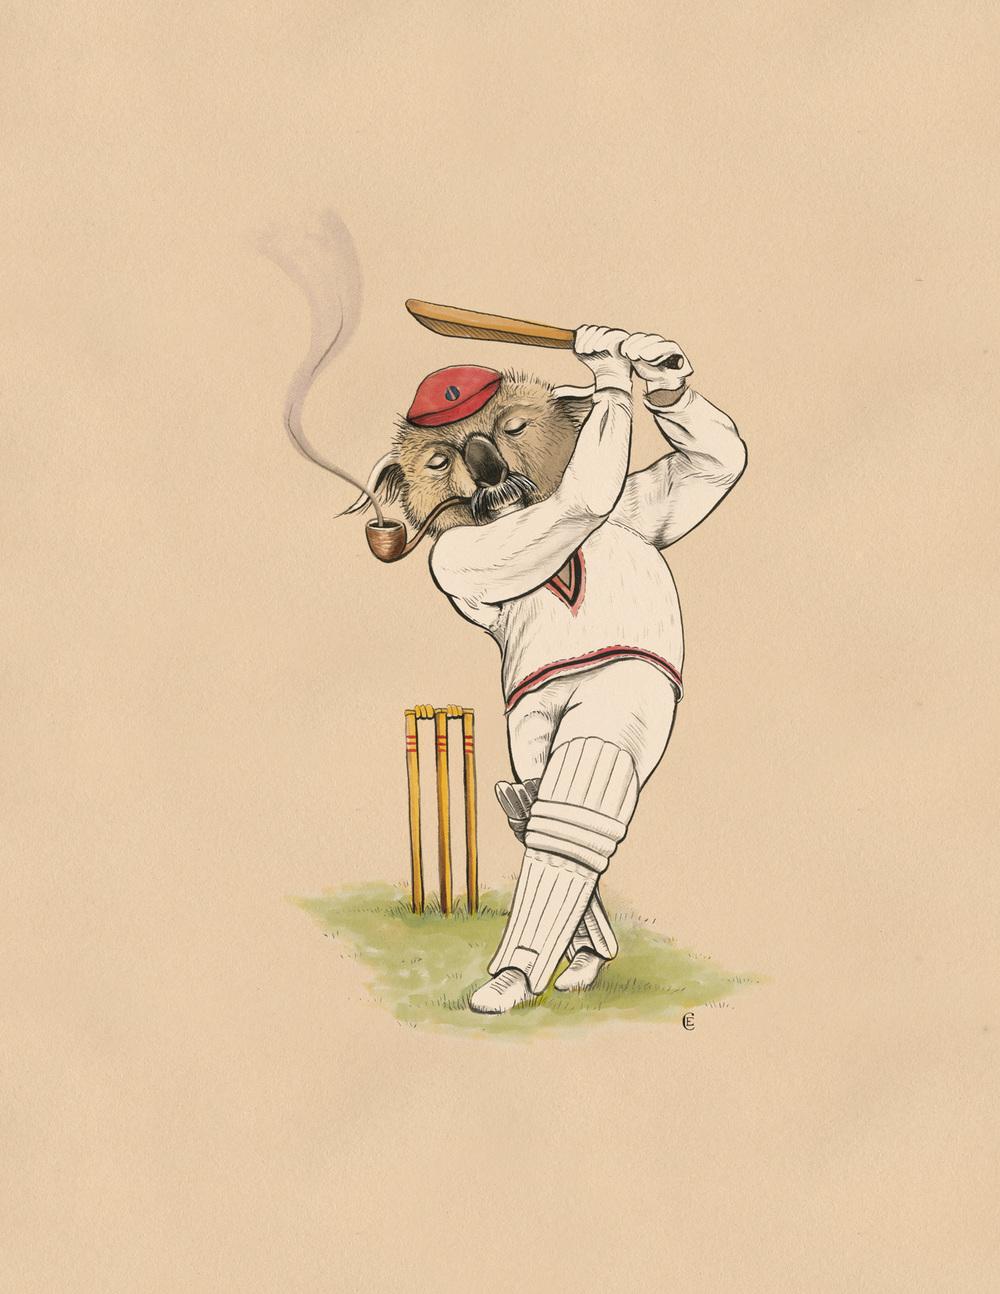 koala-batsman-cricket.jpg